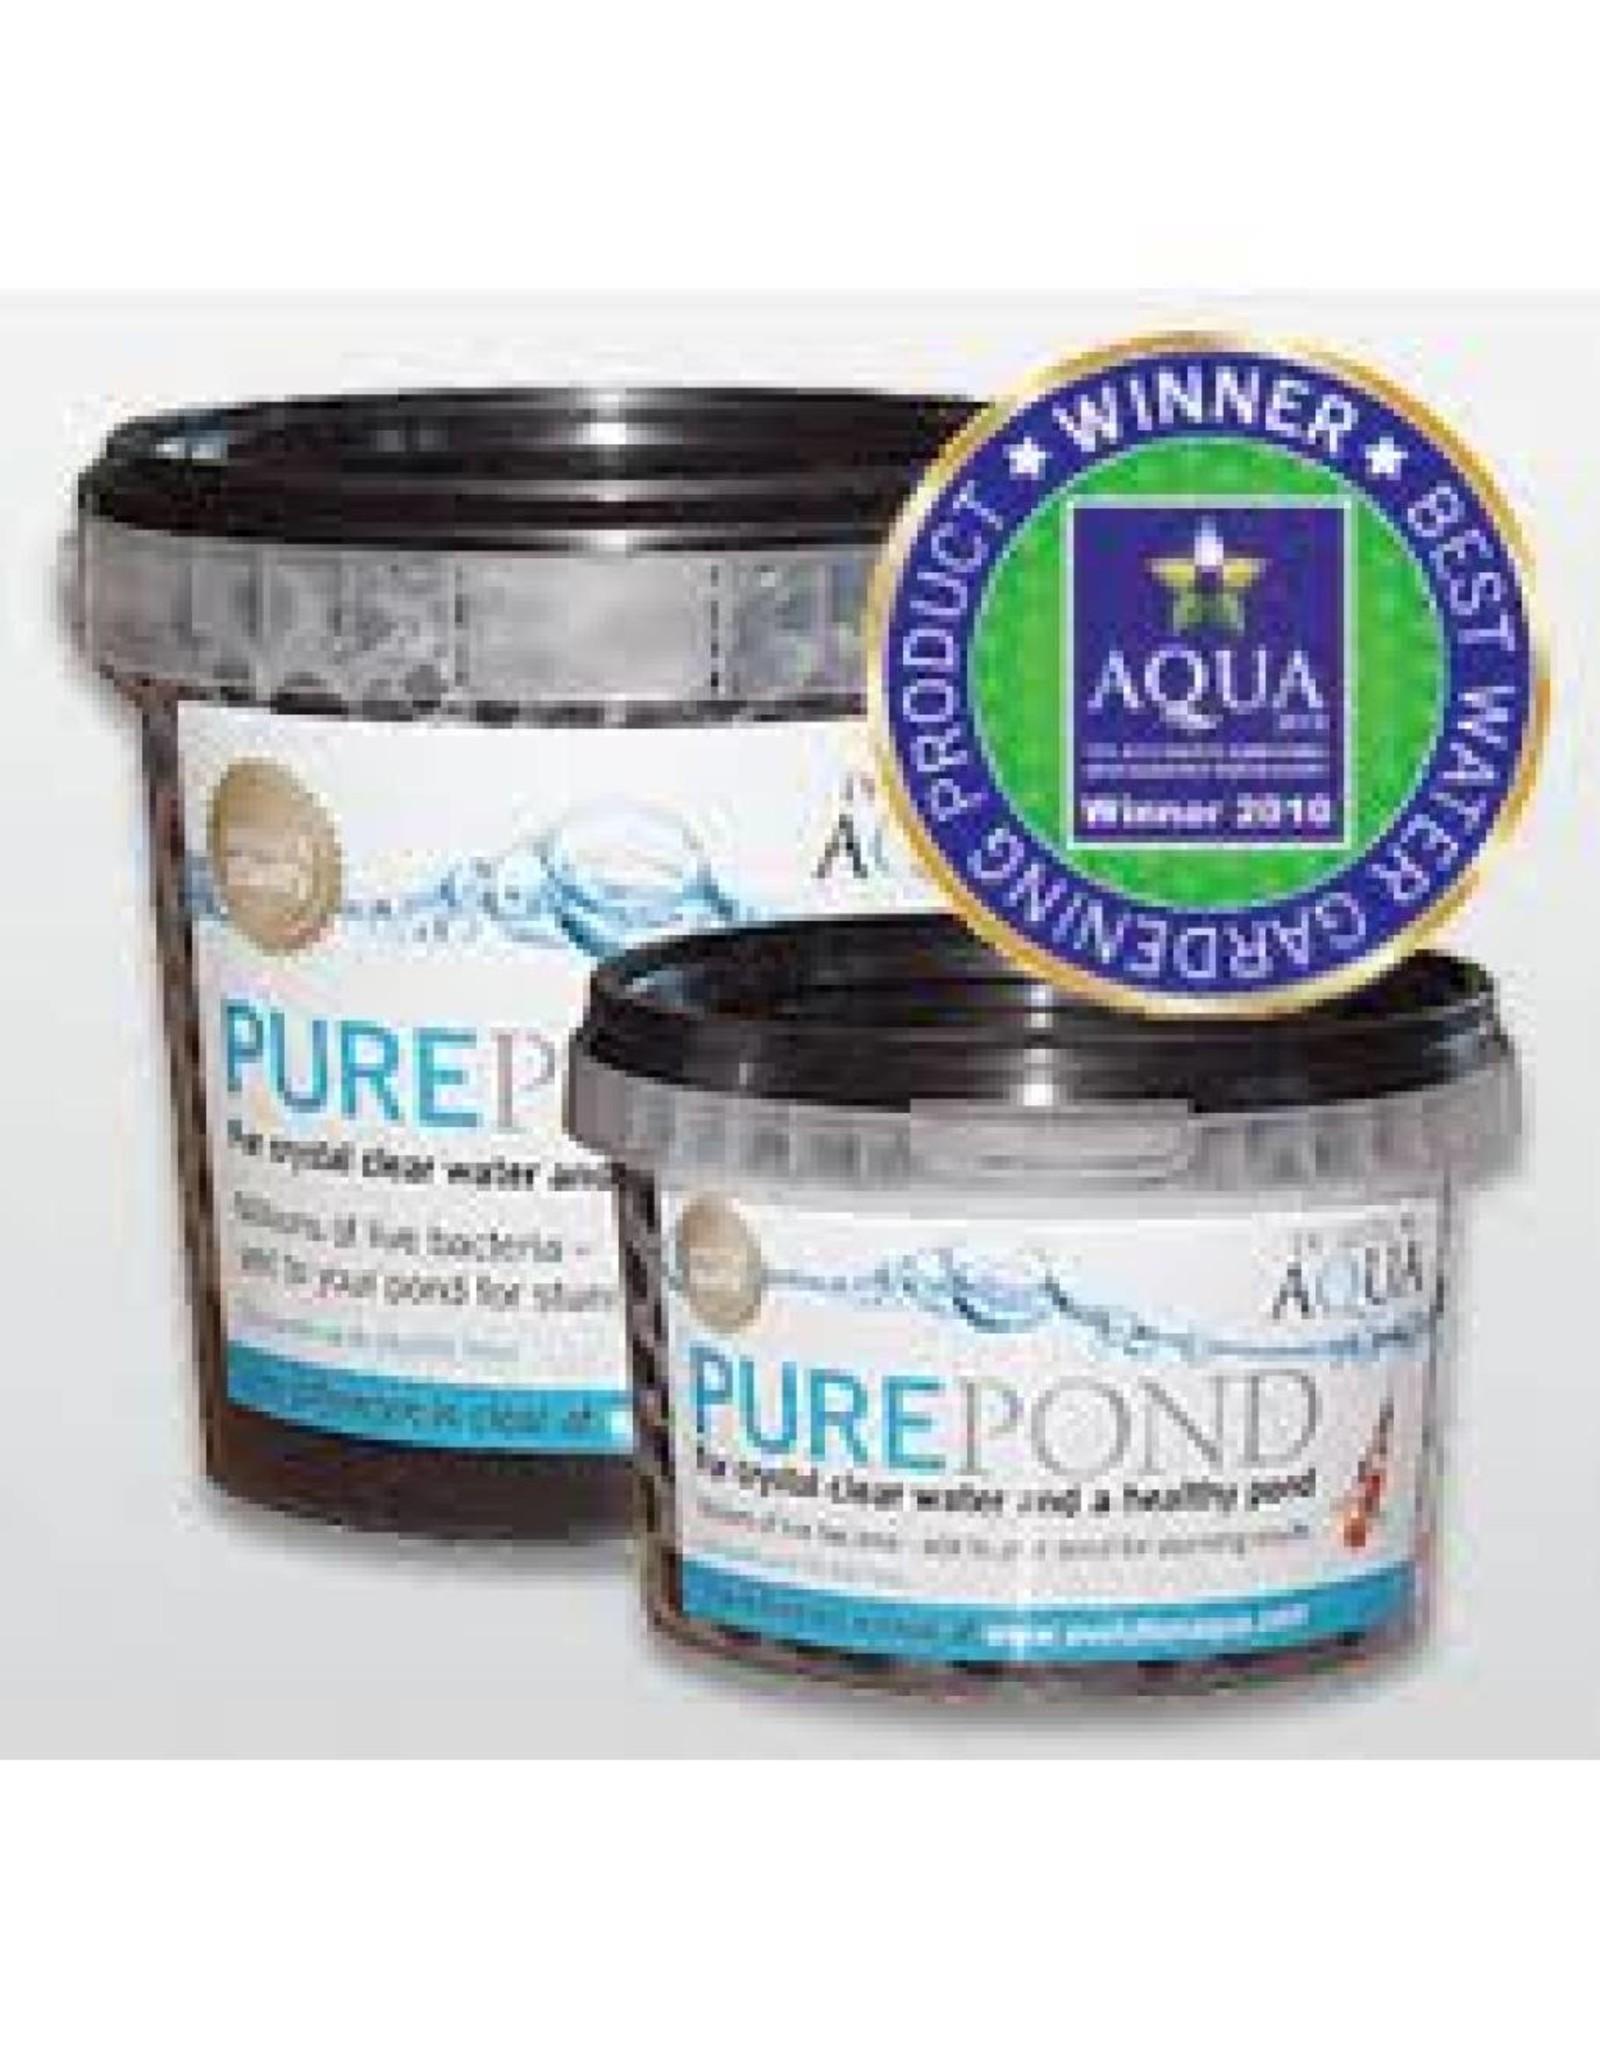 Evolution Aqua Pure Pond ballen met levende bacteriën